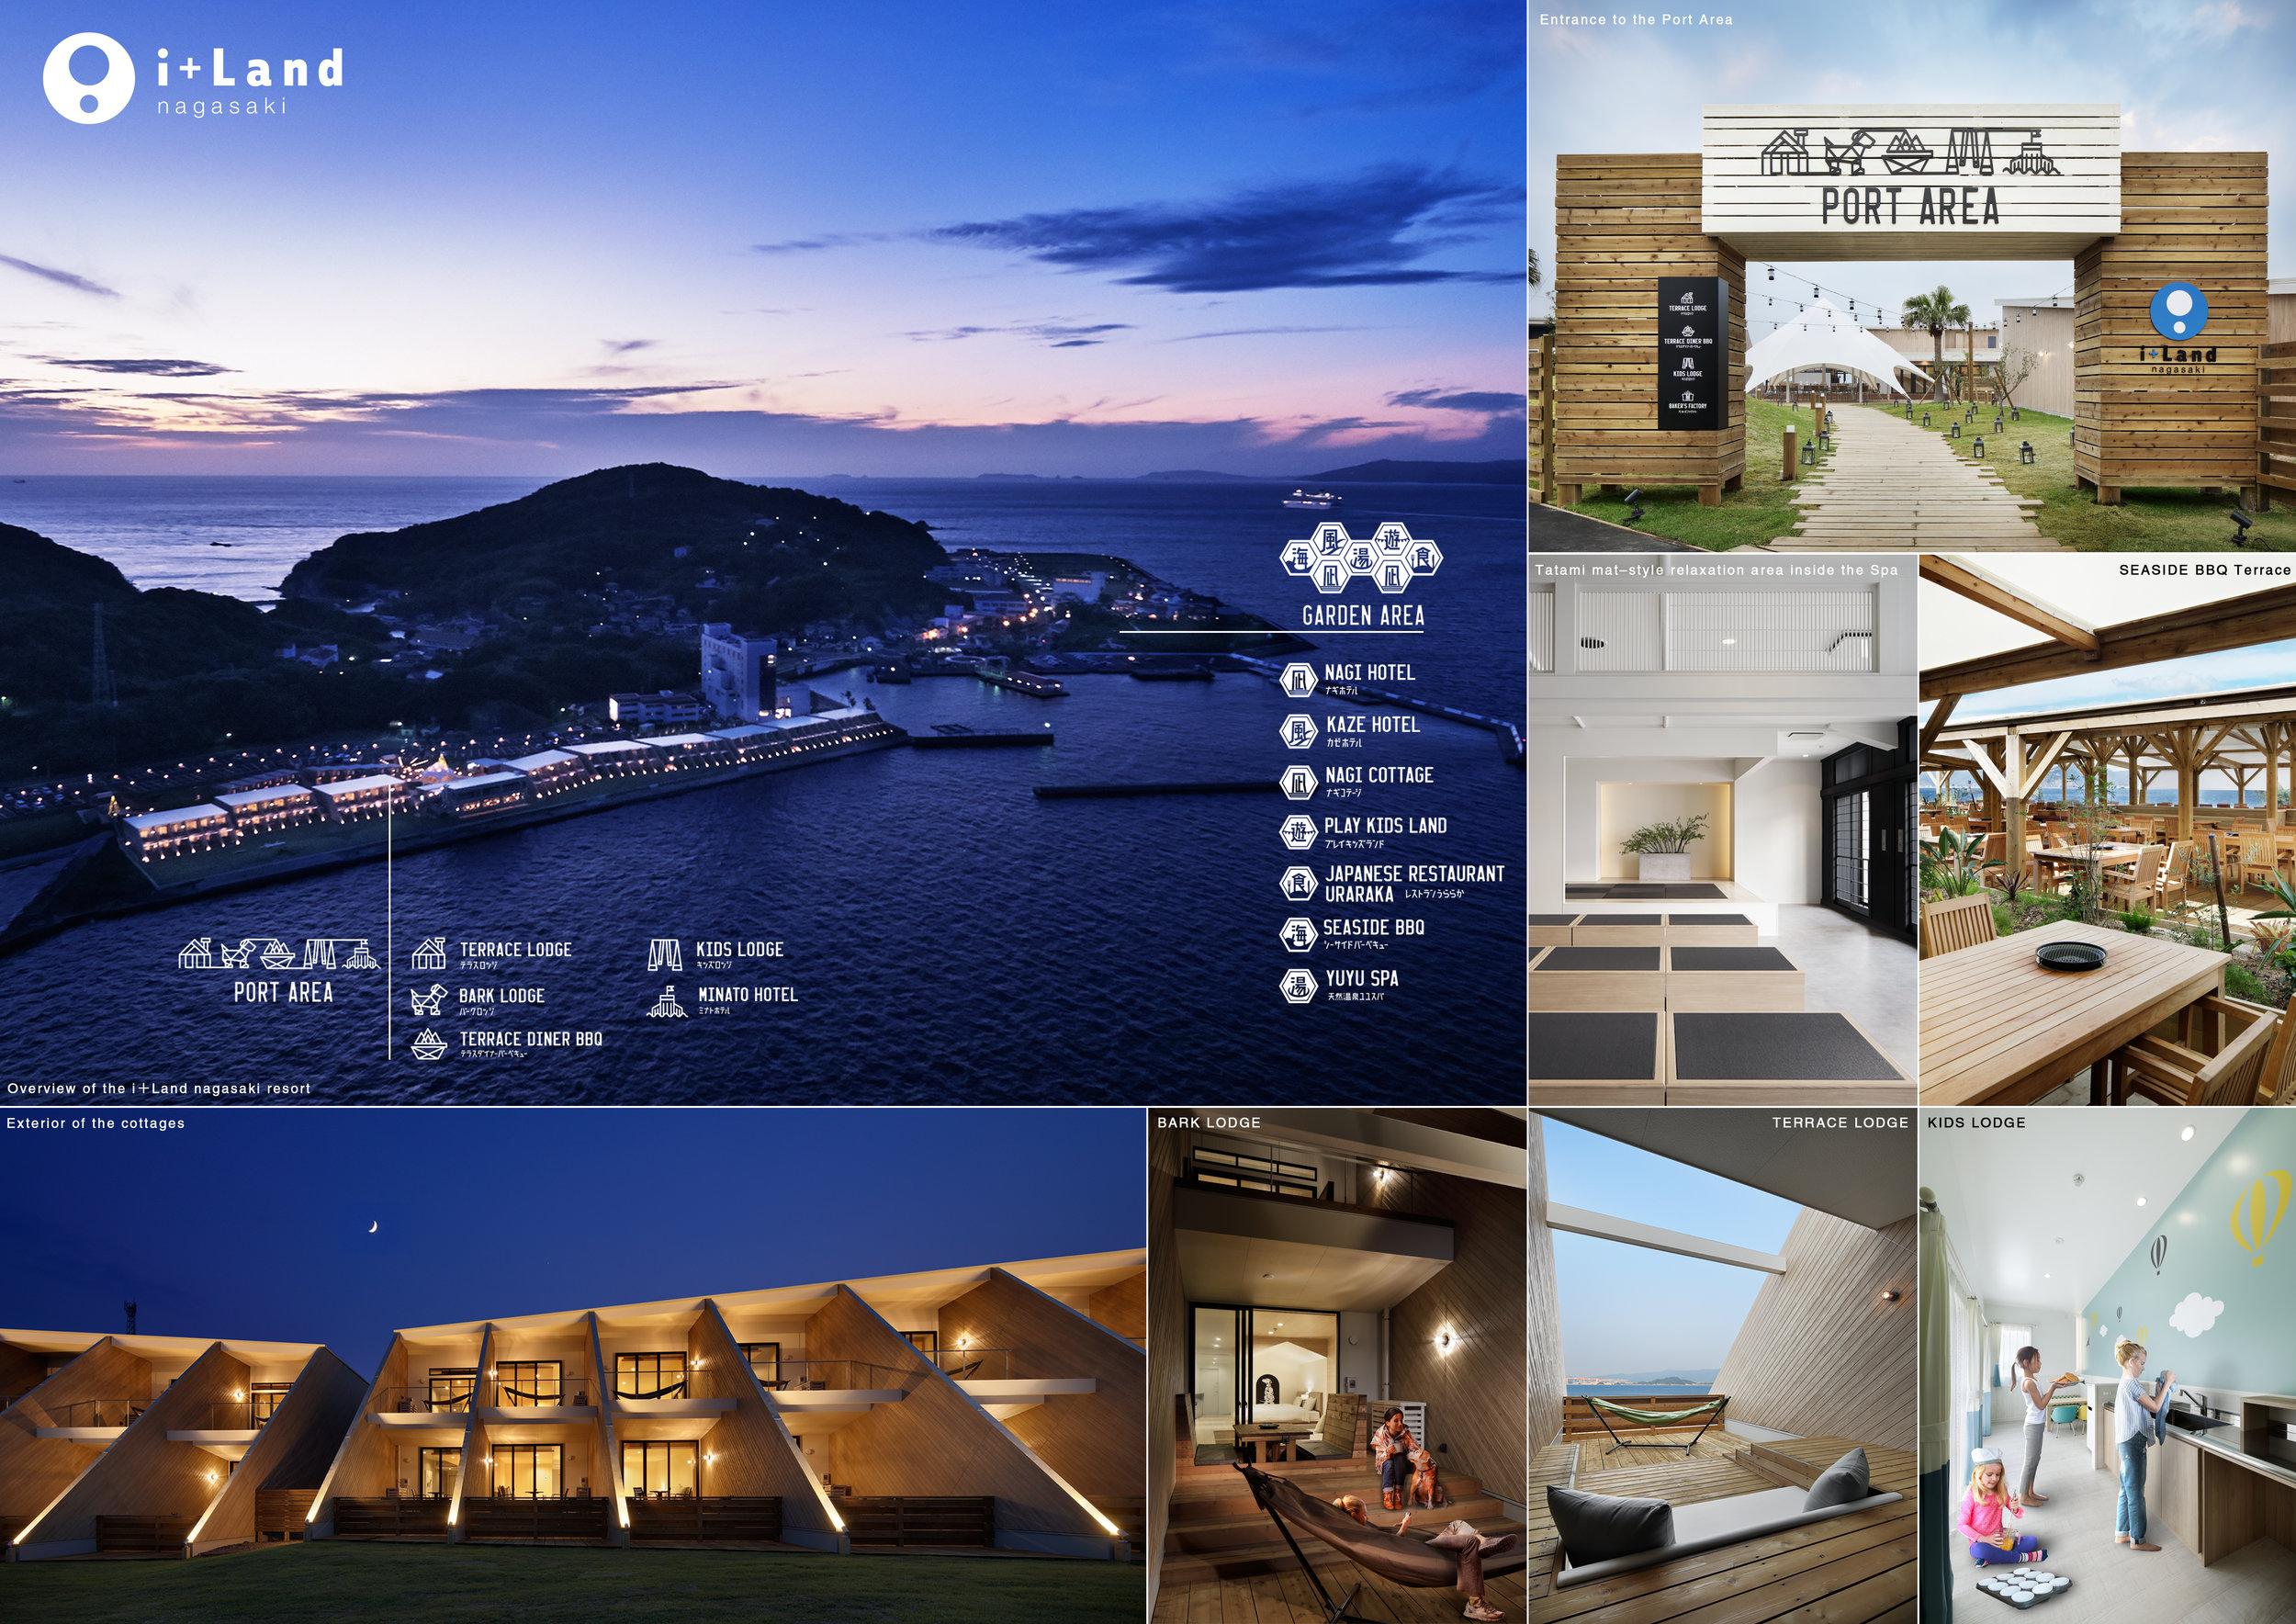 i+Land nagasaki - Design by: NOMURA Co., Ltd.Interior Division: Hotel & ResortWebsite: http://www.nomurakougei.co.jp/english/